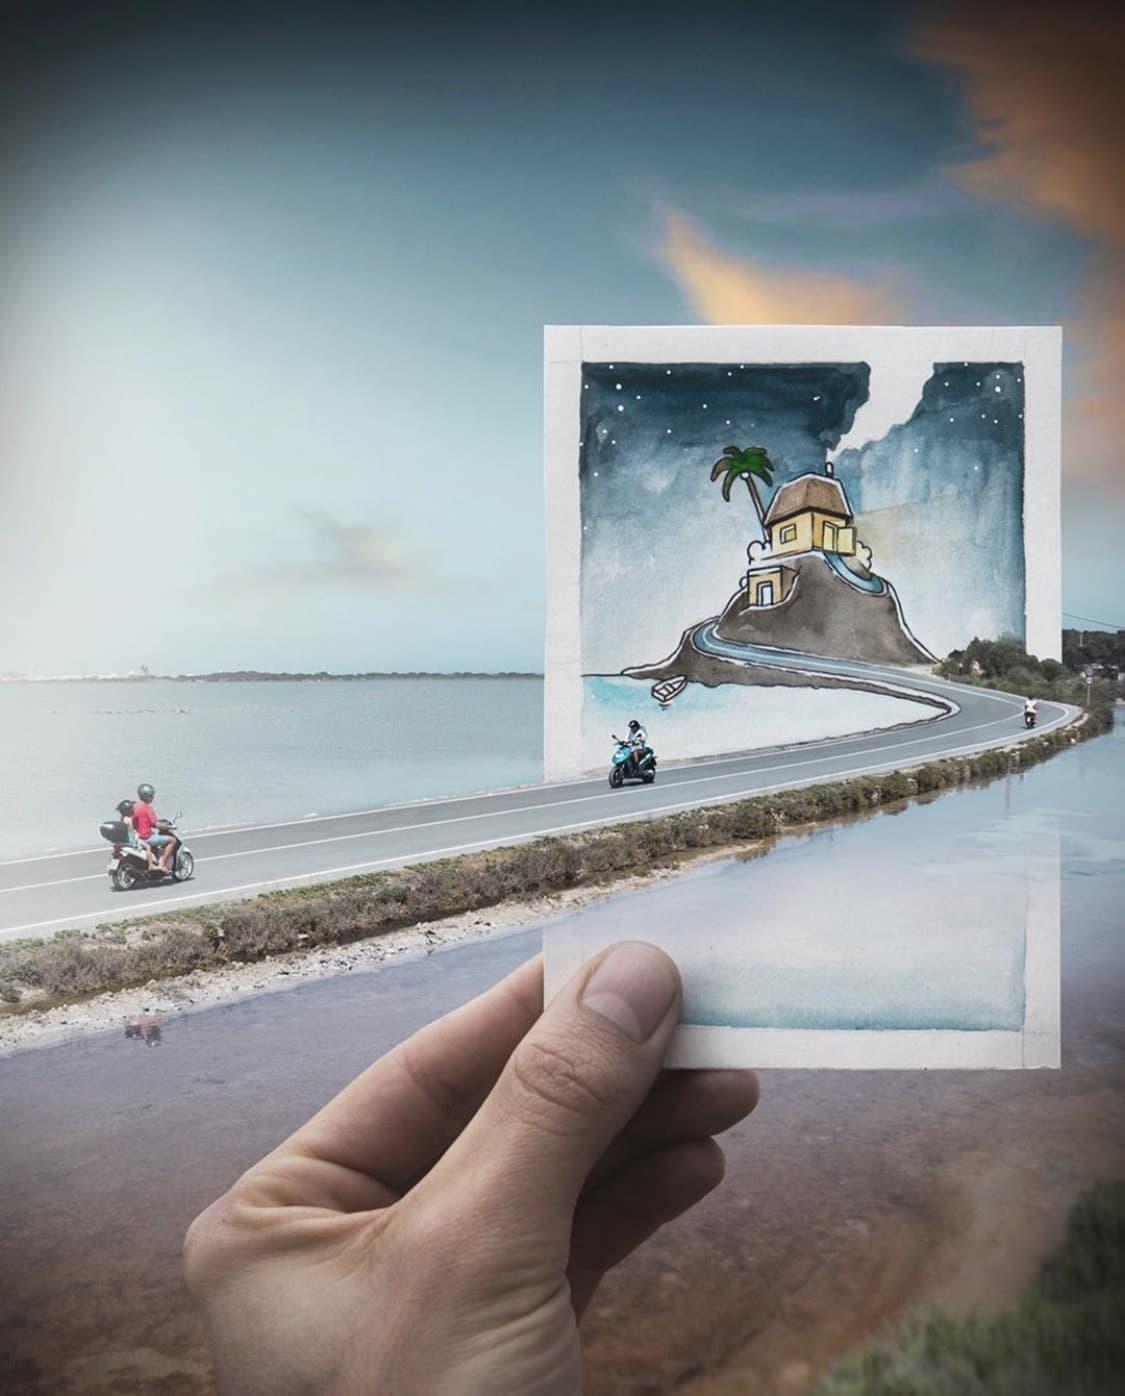 Sergi Tugas Fotomanipulationen